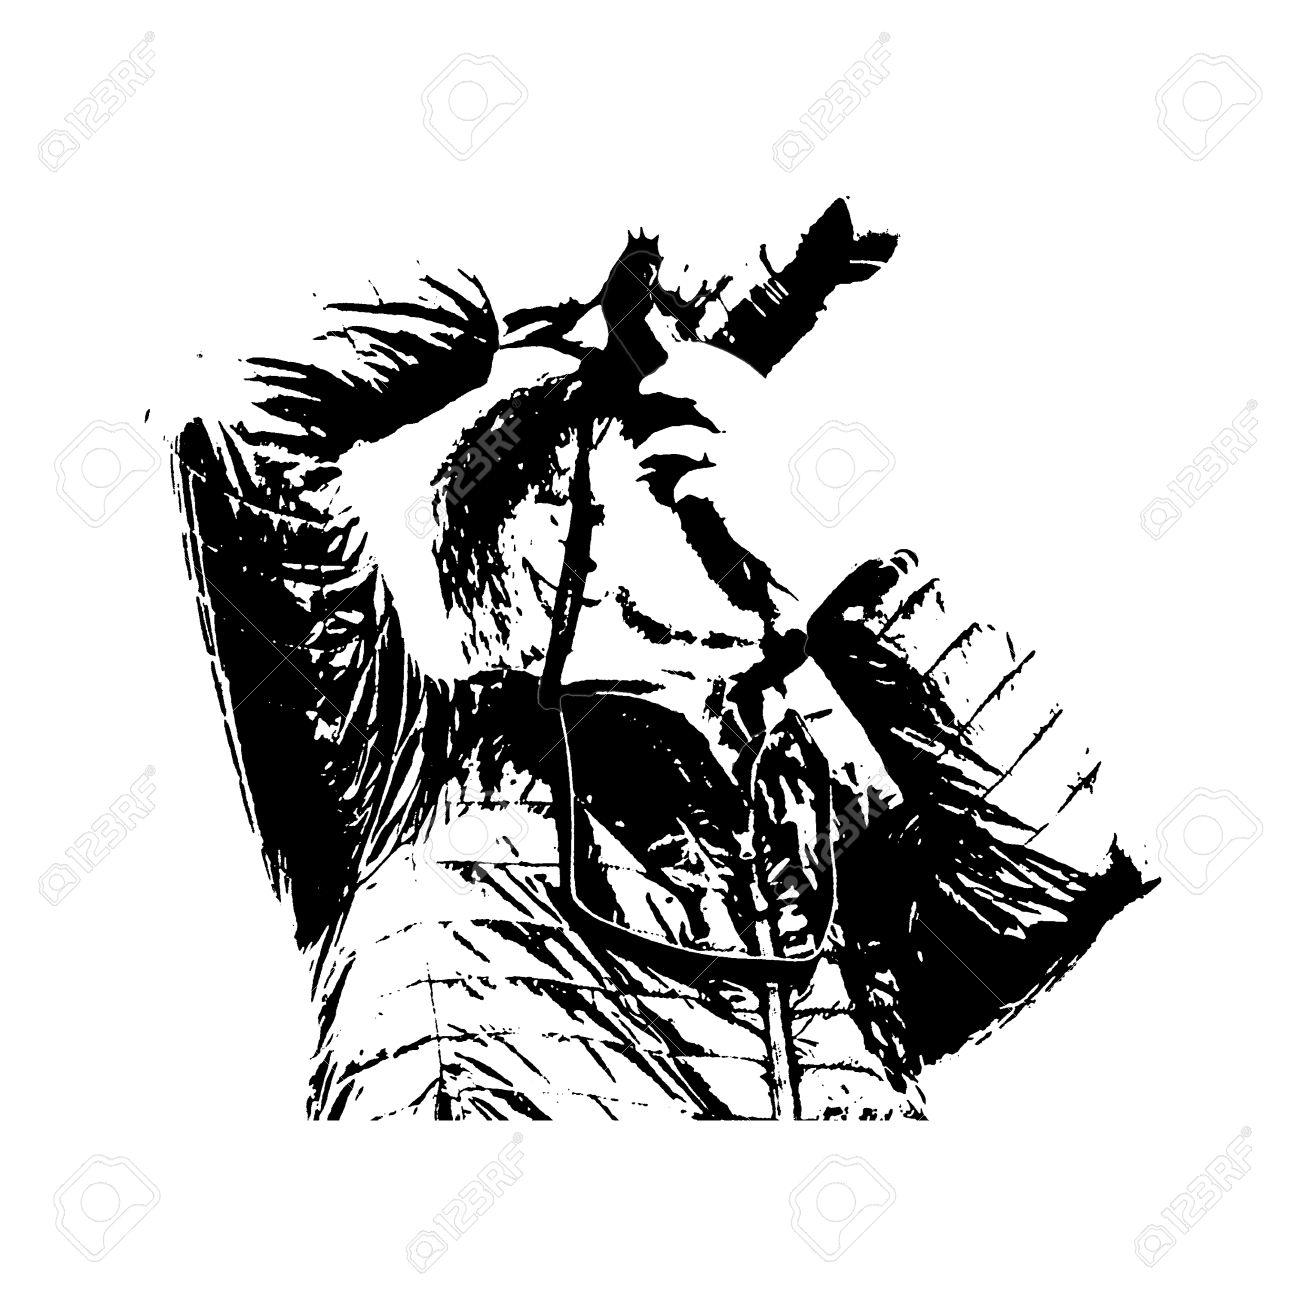 Stencil Art Technique Graphic Illustration Side View Adult Mand.